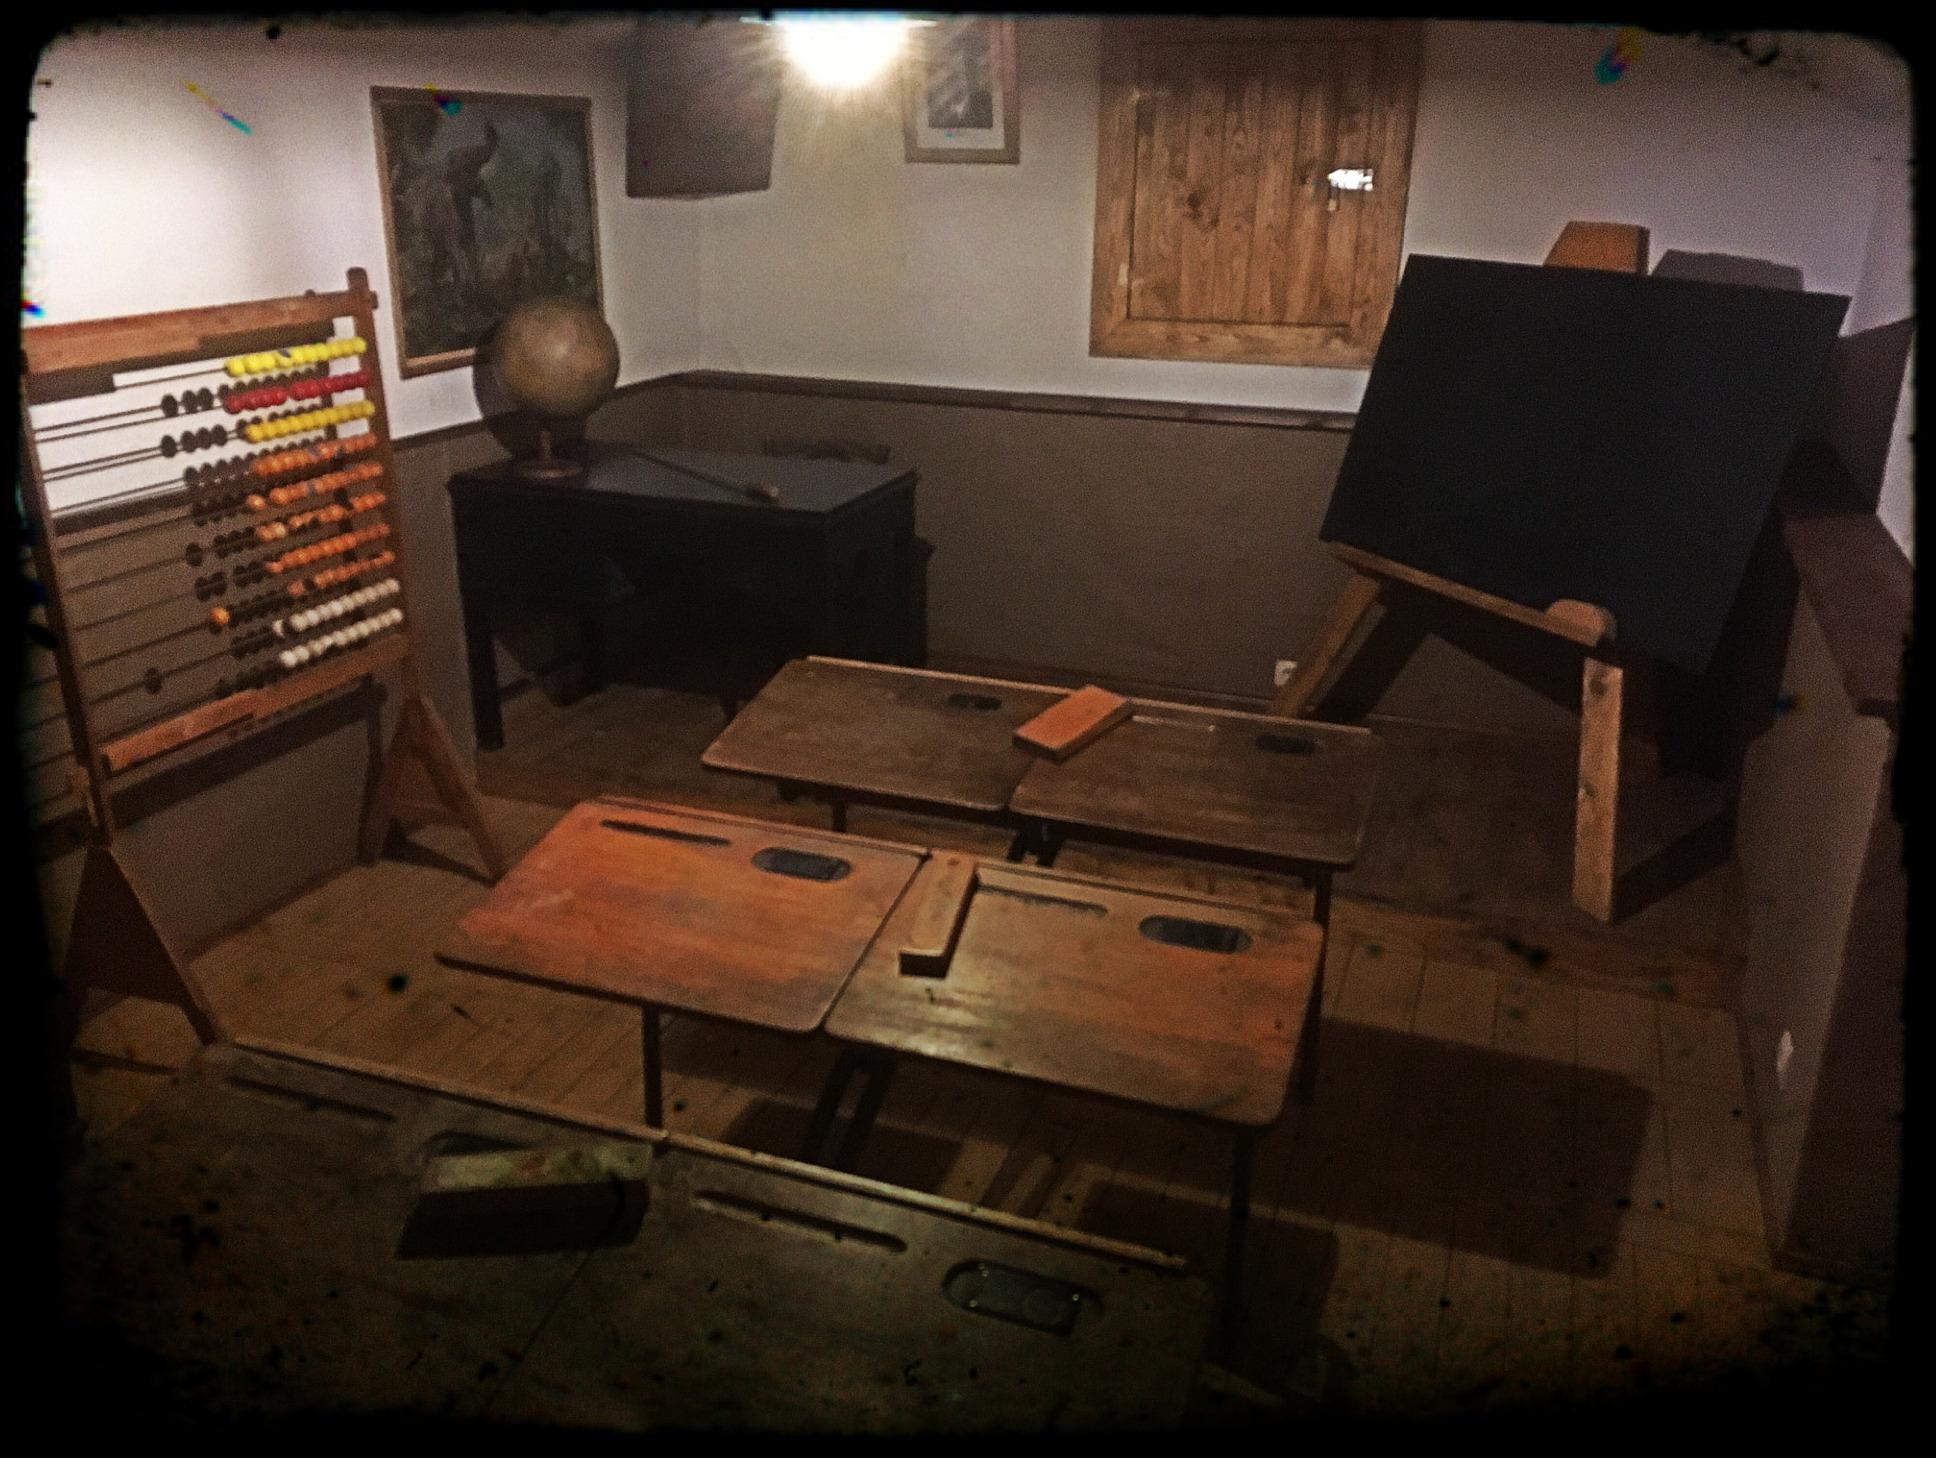 Nové únikové místnosti v Praze